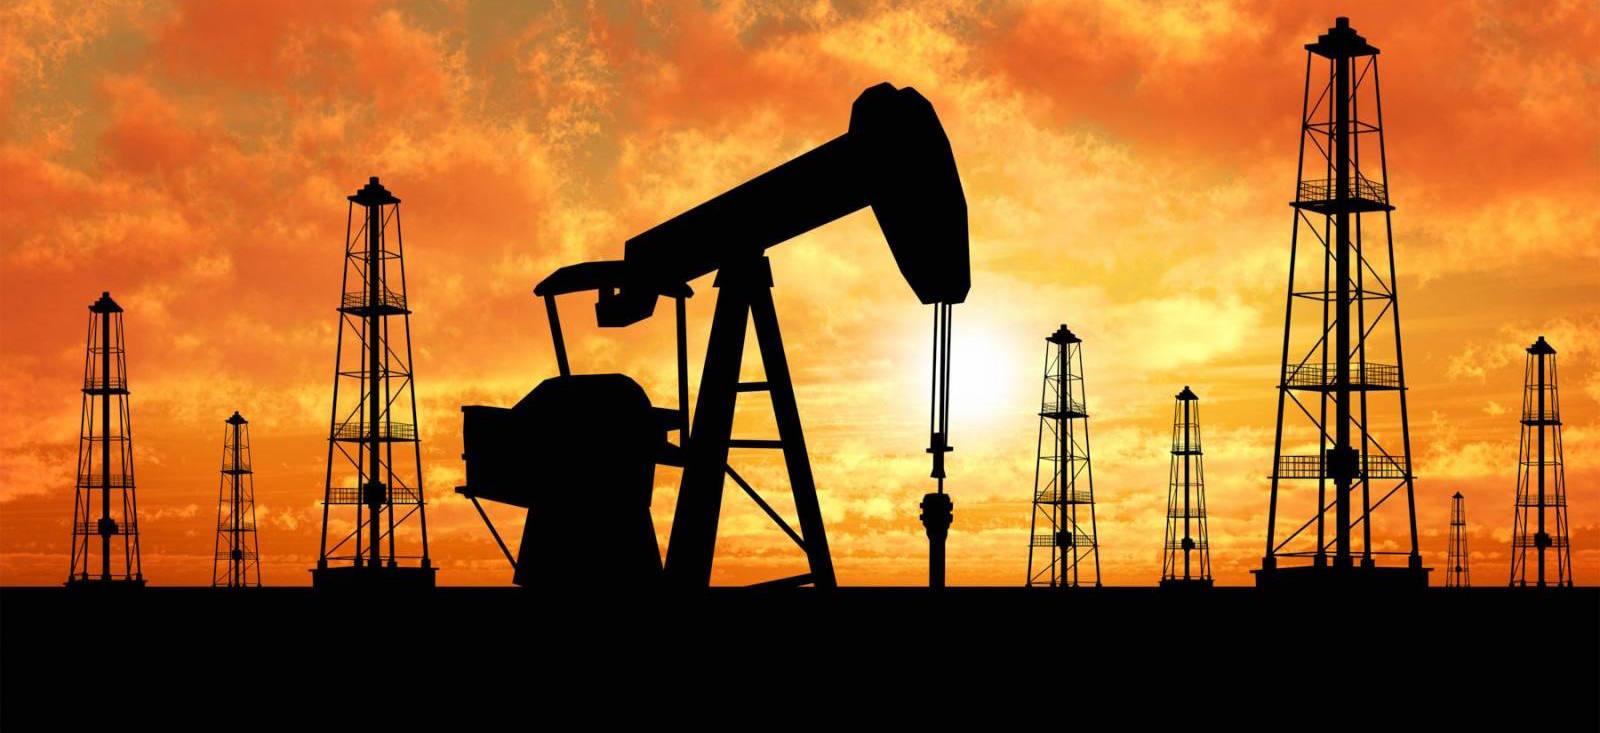 импортная цена, цены на нефть, снижение цен